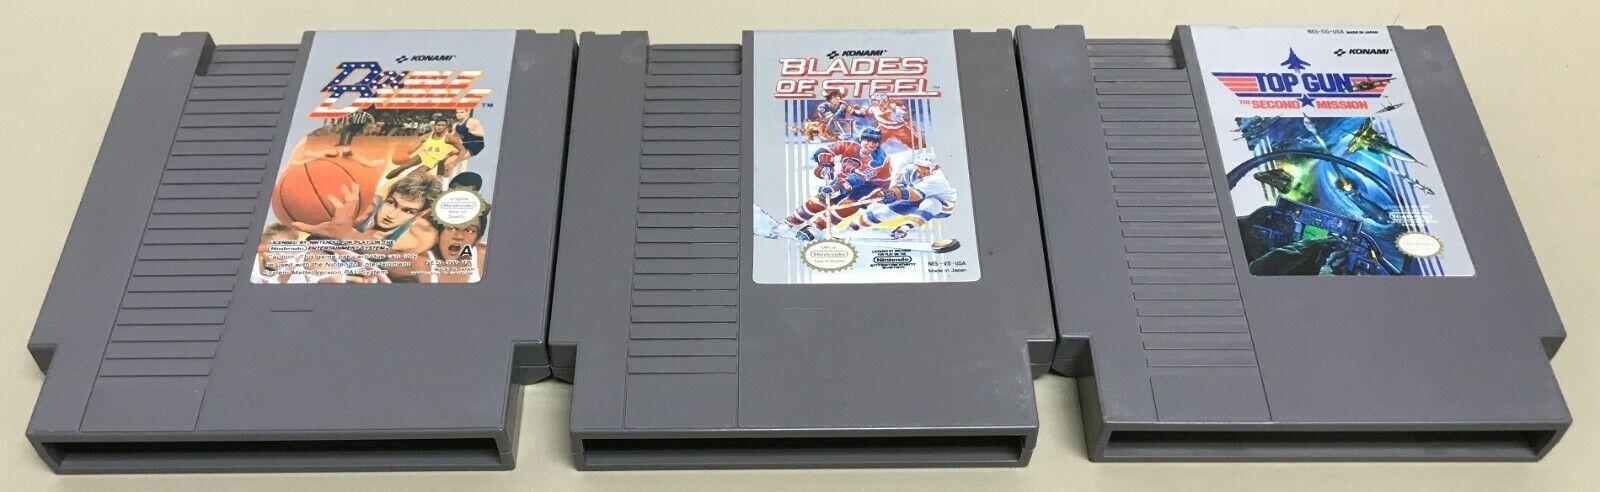 Blades of Steel, Top Gun, Double Dribble 3 NES Konami Game Lot Nintendo